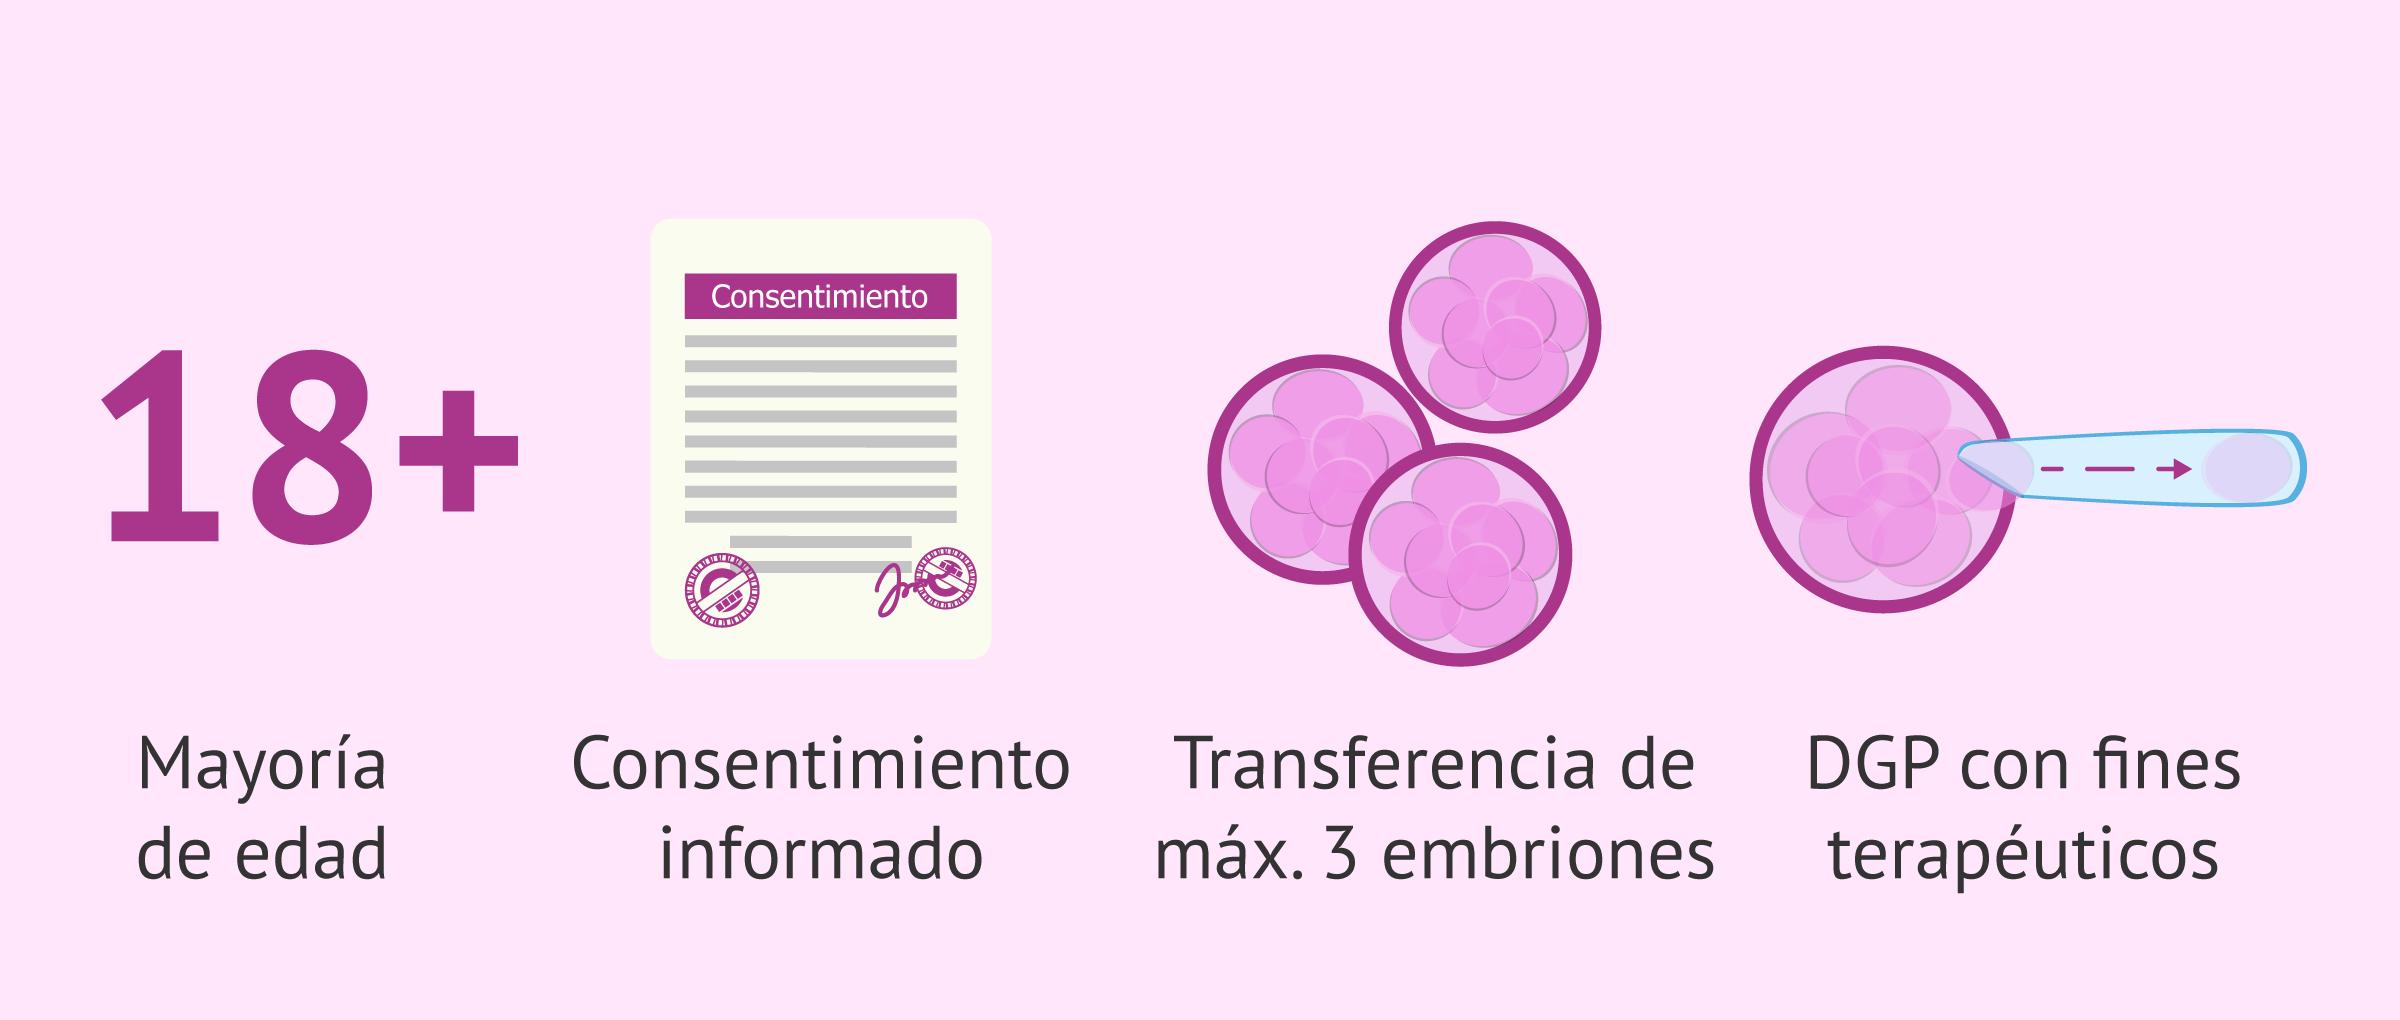 Ley 14/2006 de reproducción humana asistida en España